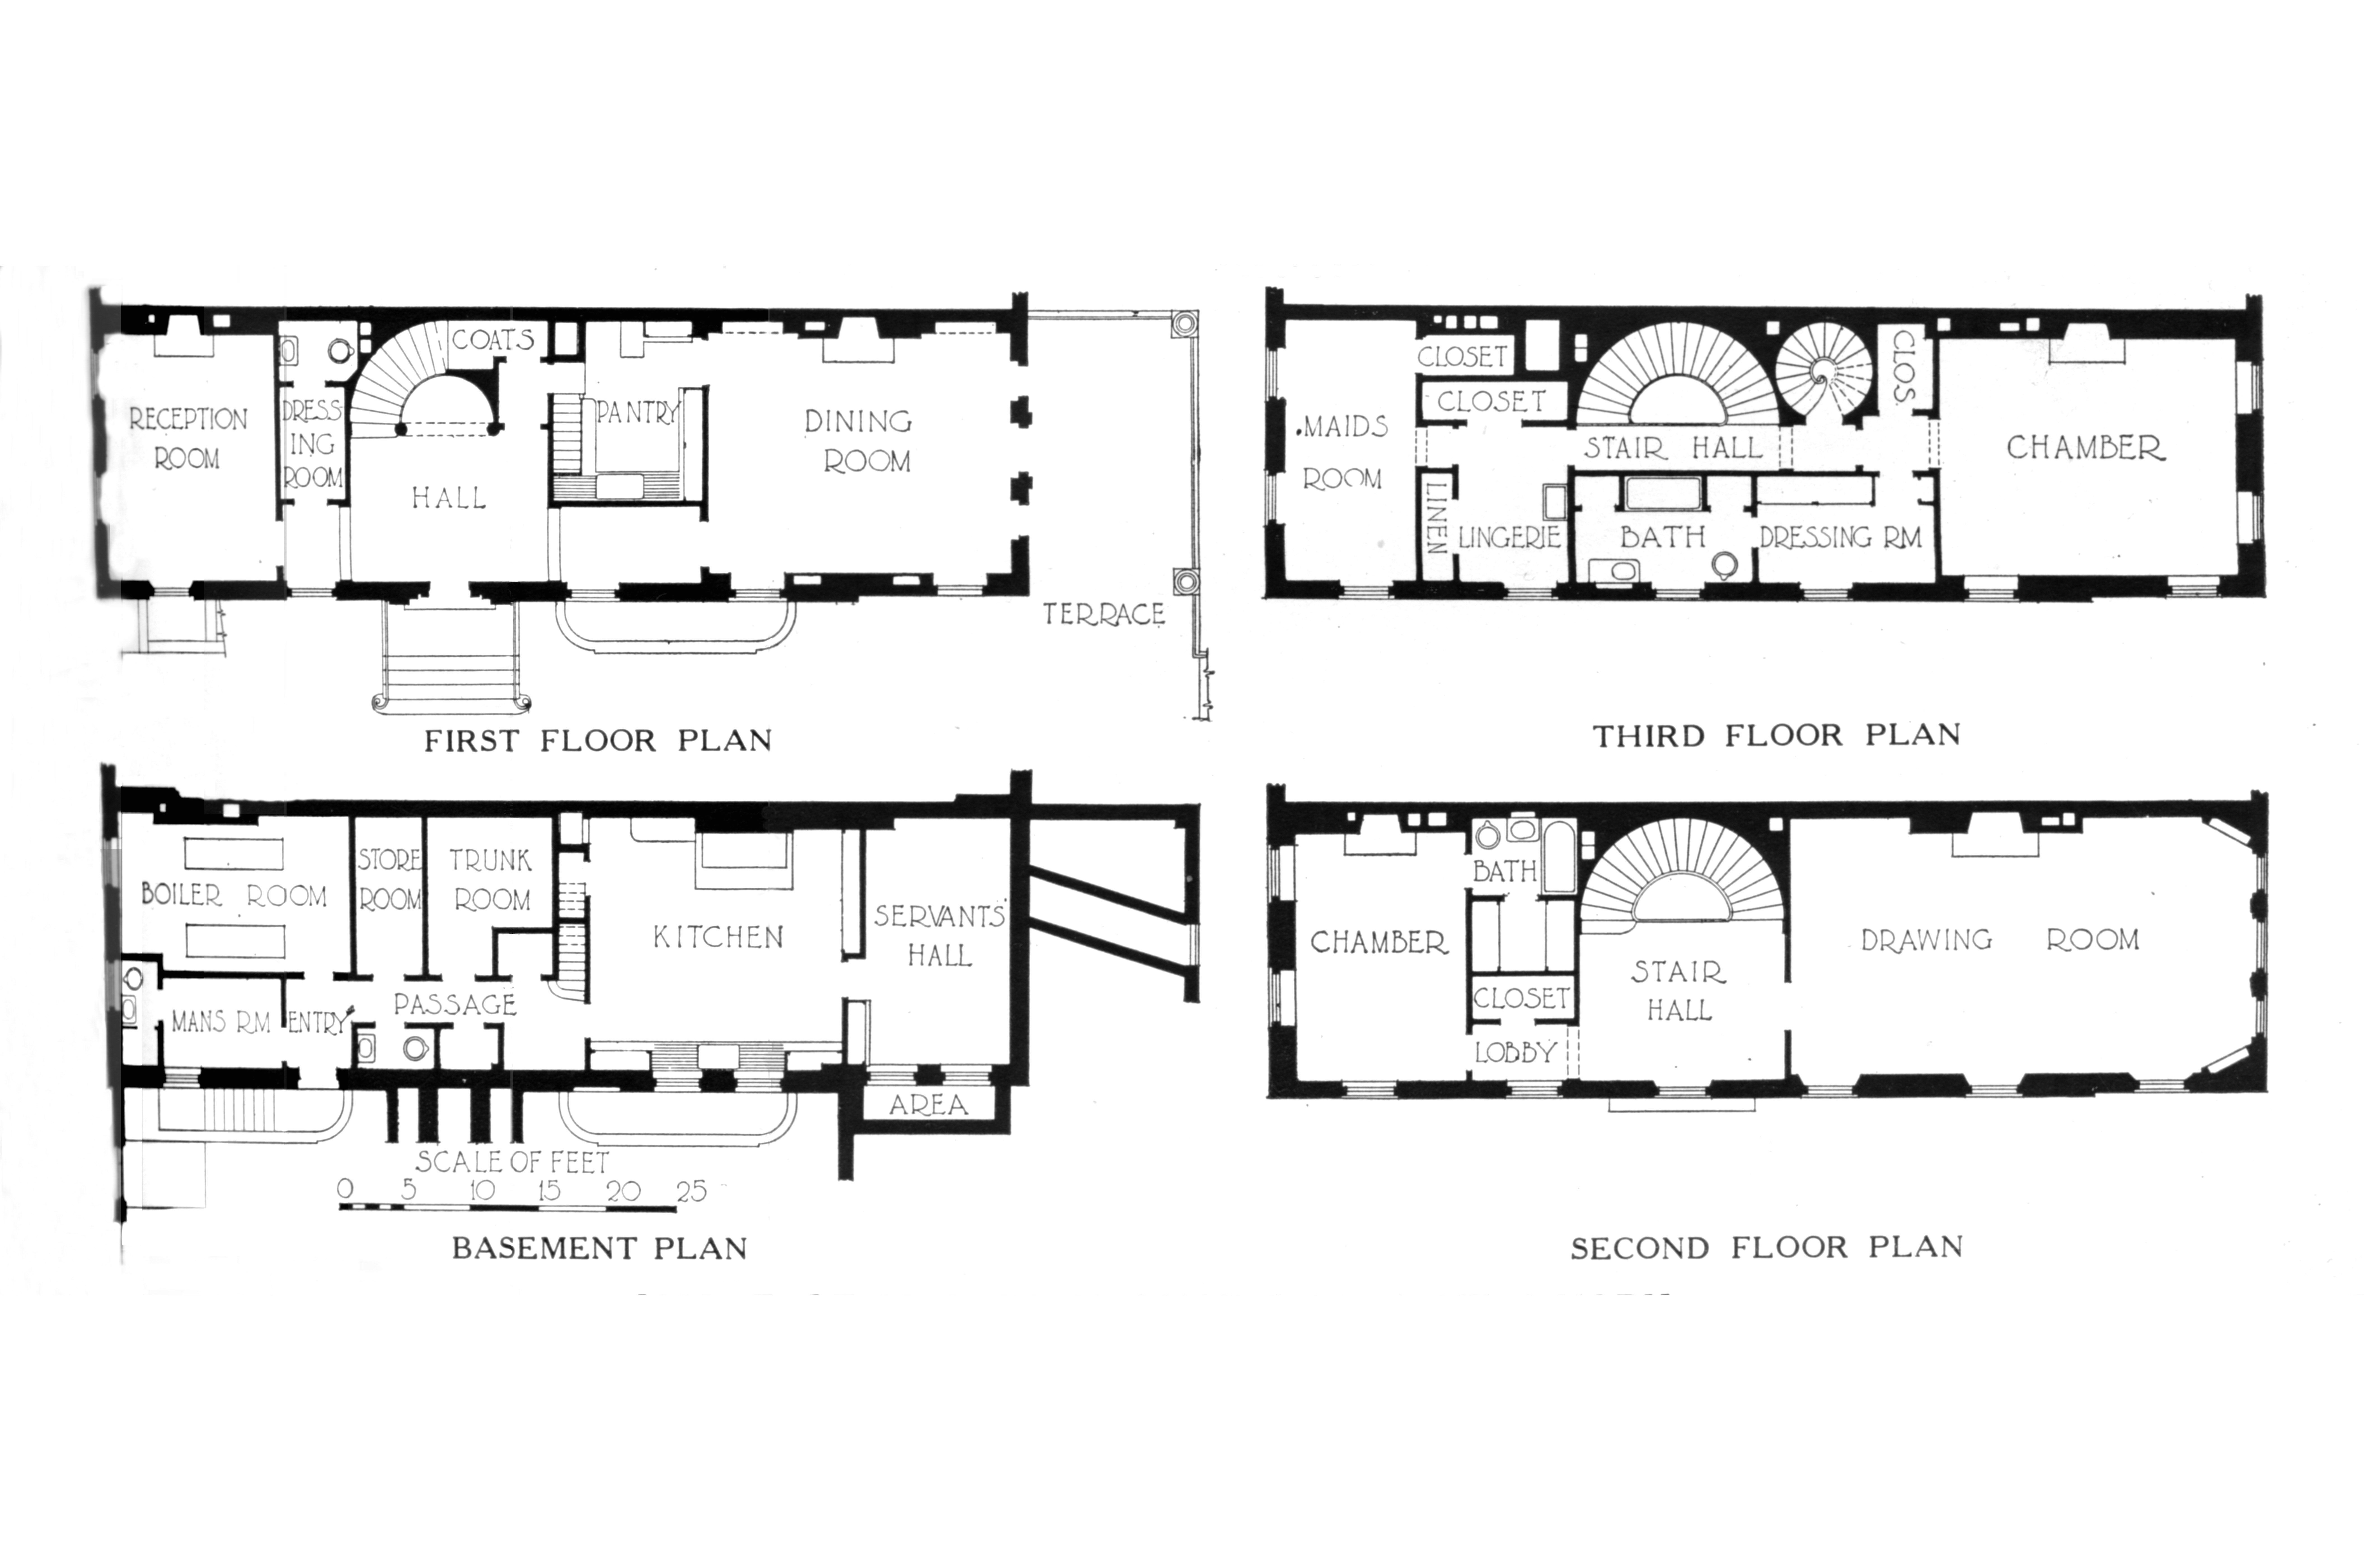 building floorpolan 615464084 bord 58faad9f3df78ca15973108e jpg